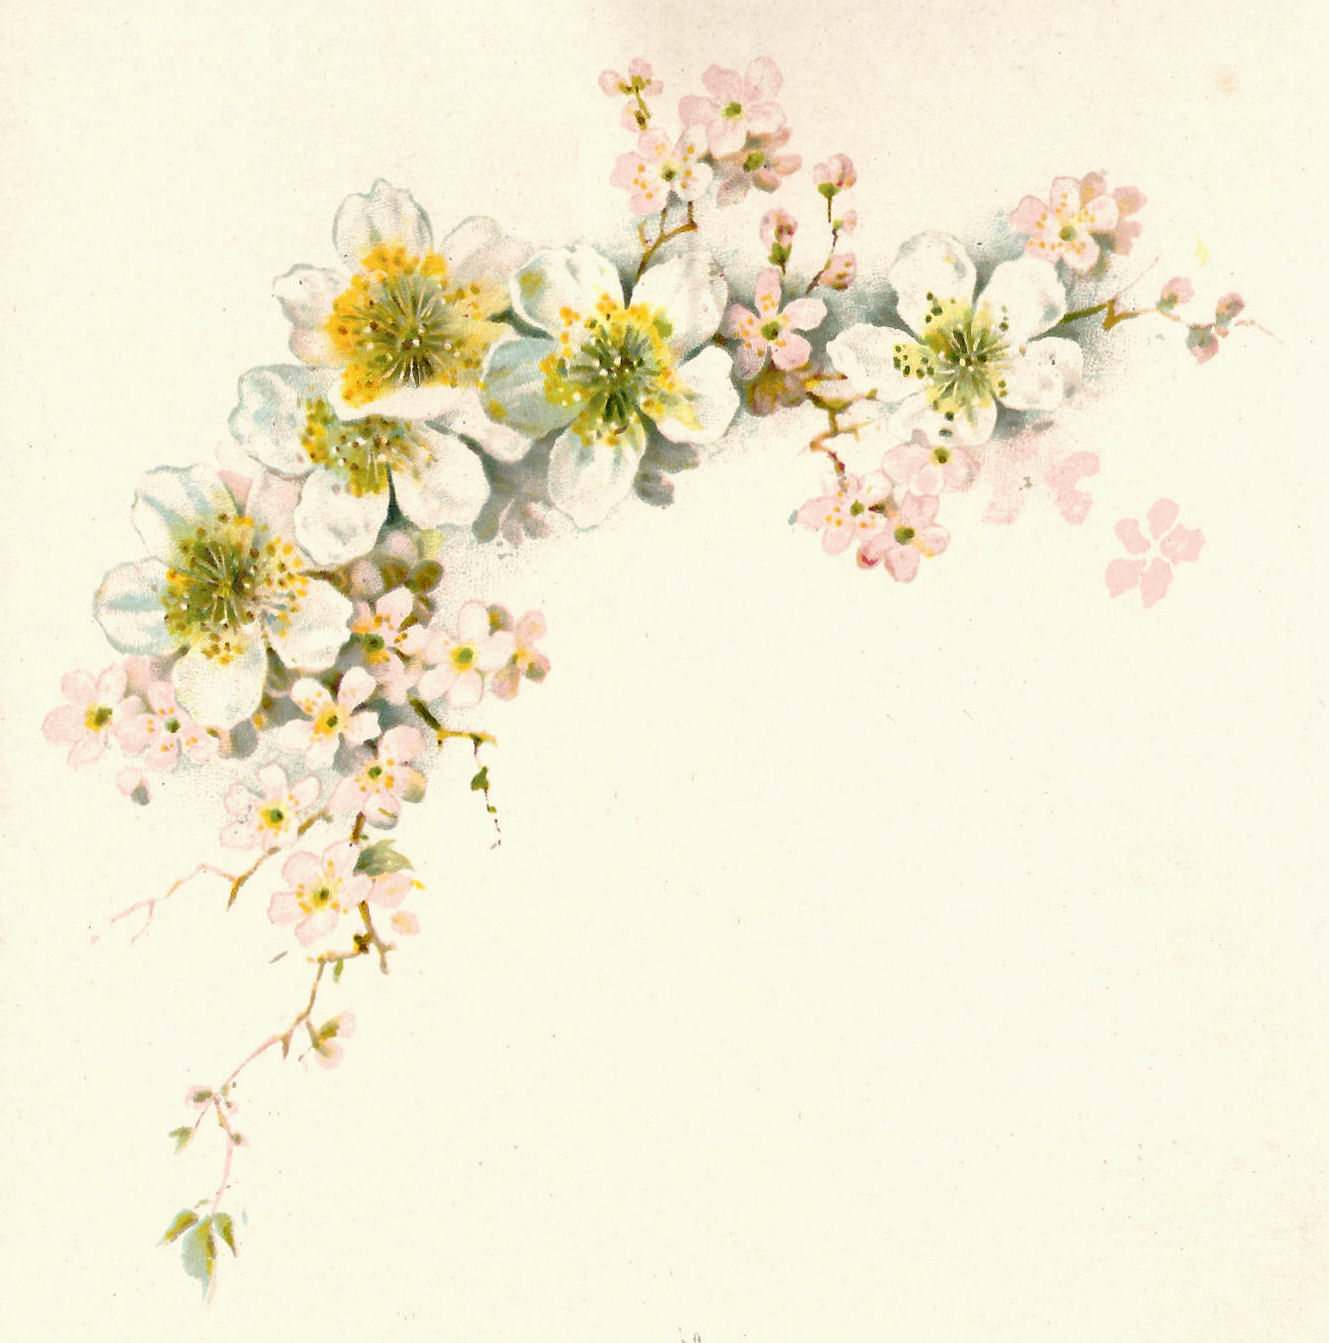 16 Antique Flower Graphic Images